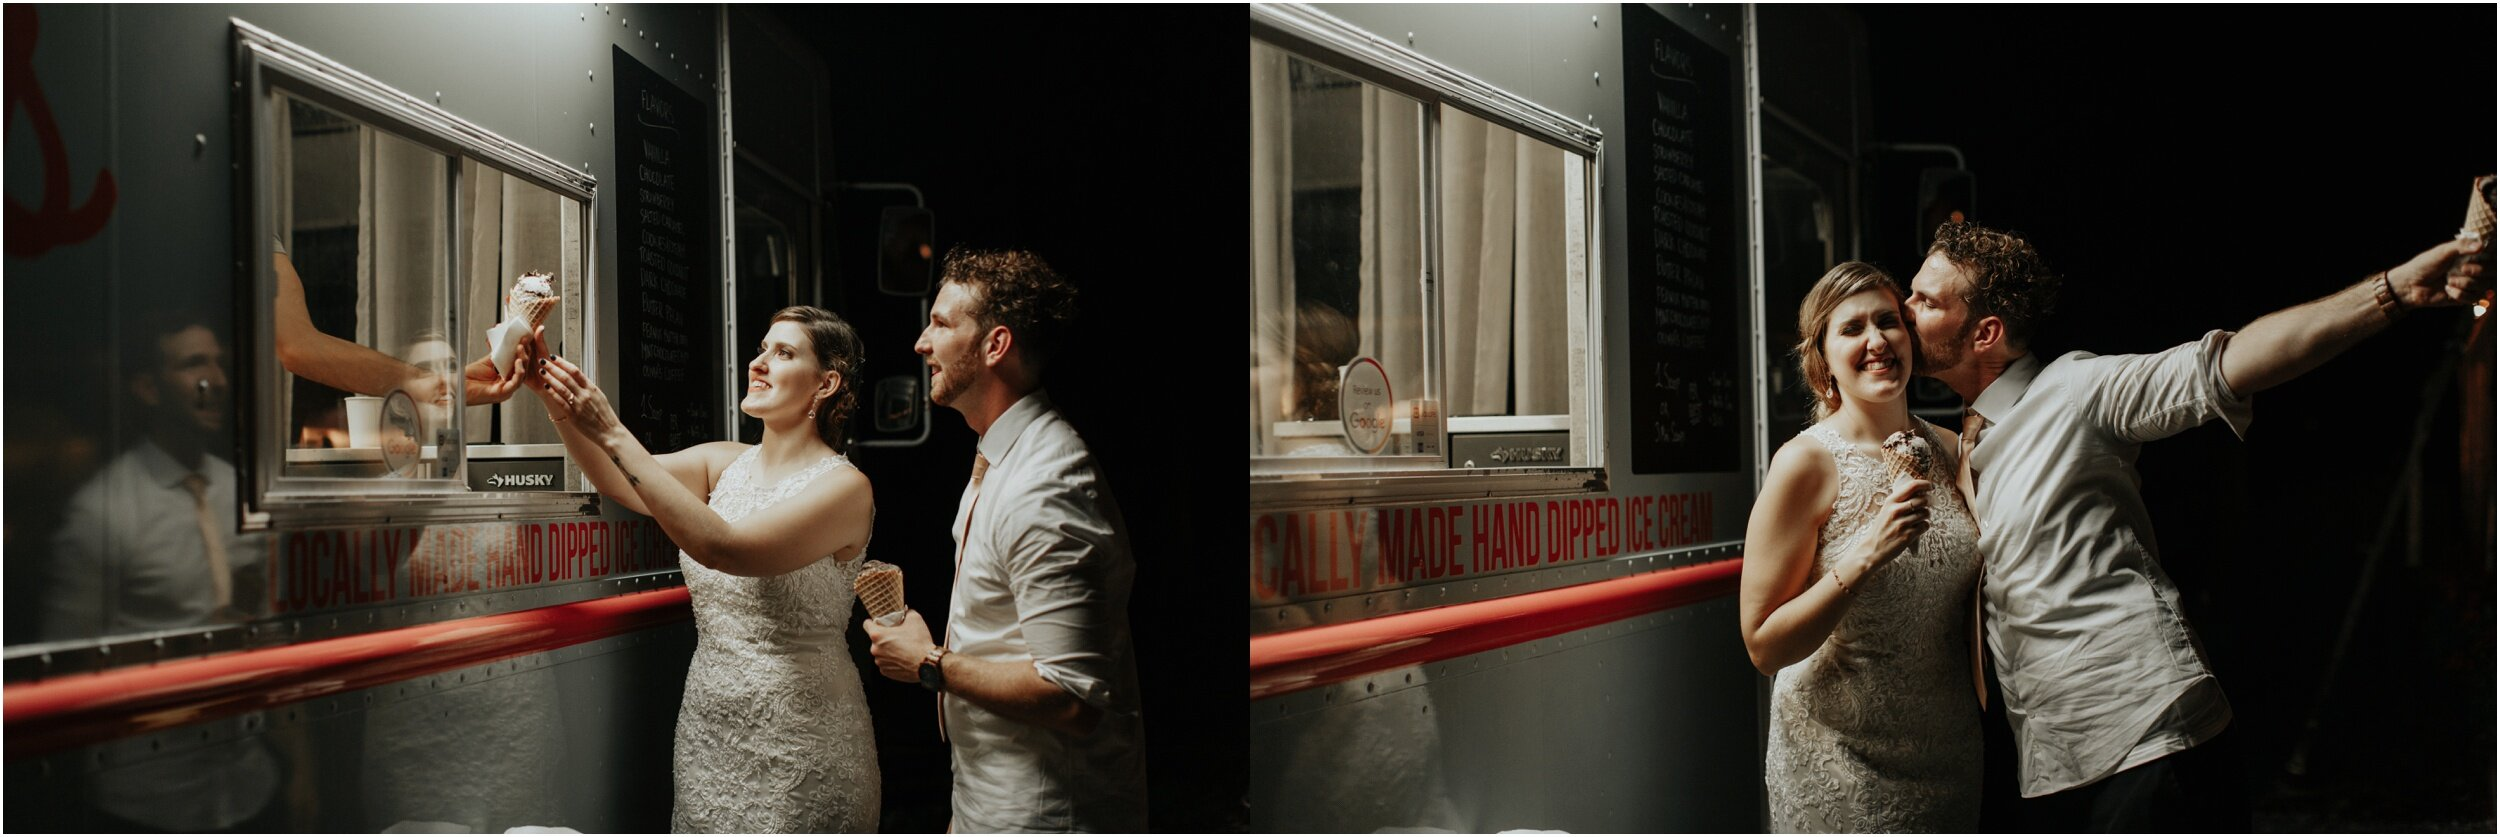 steph-and-jordan-cox-our-wedding-historic-shady-lane-compass-wedding-collective-hazel-lining-photography-destination-elopement-wedding-engagement-photography_0099.jpg